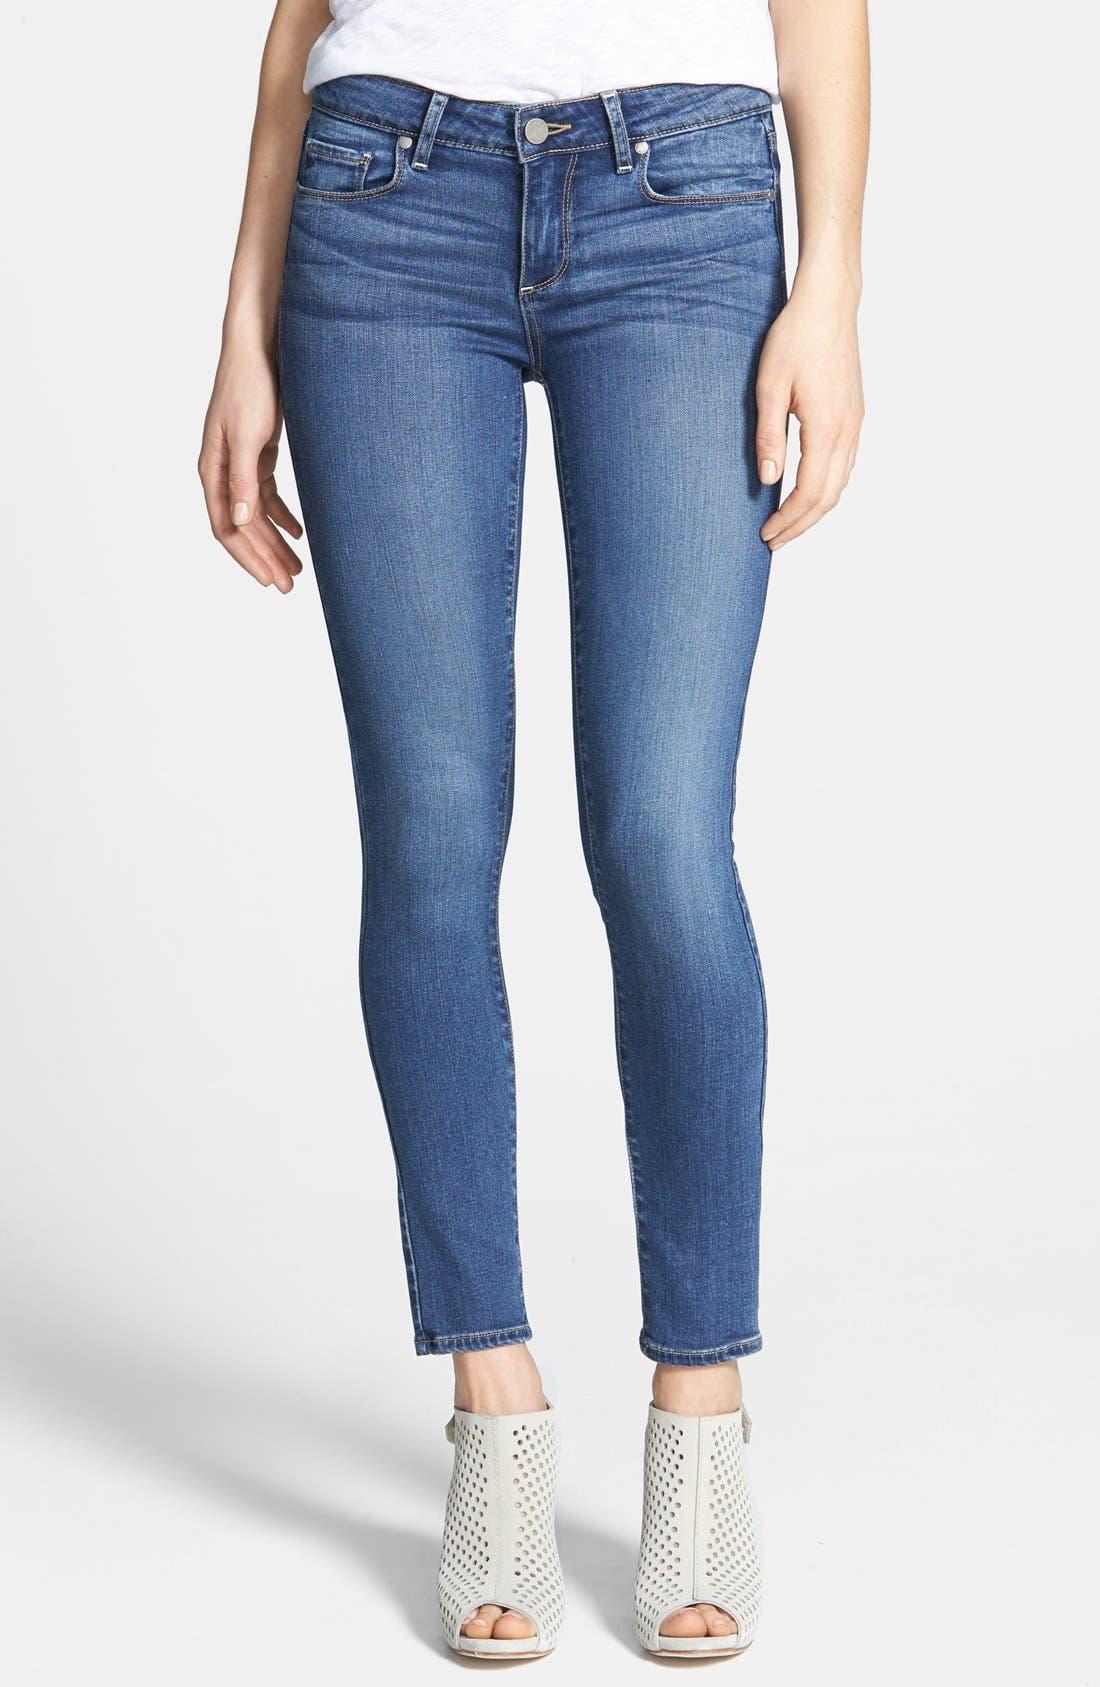 PAIGE Transcend - Verdugo Ankle Skinny Jeans (Tristan)